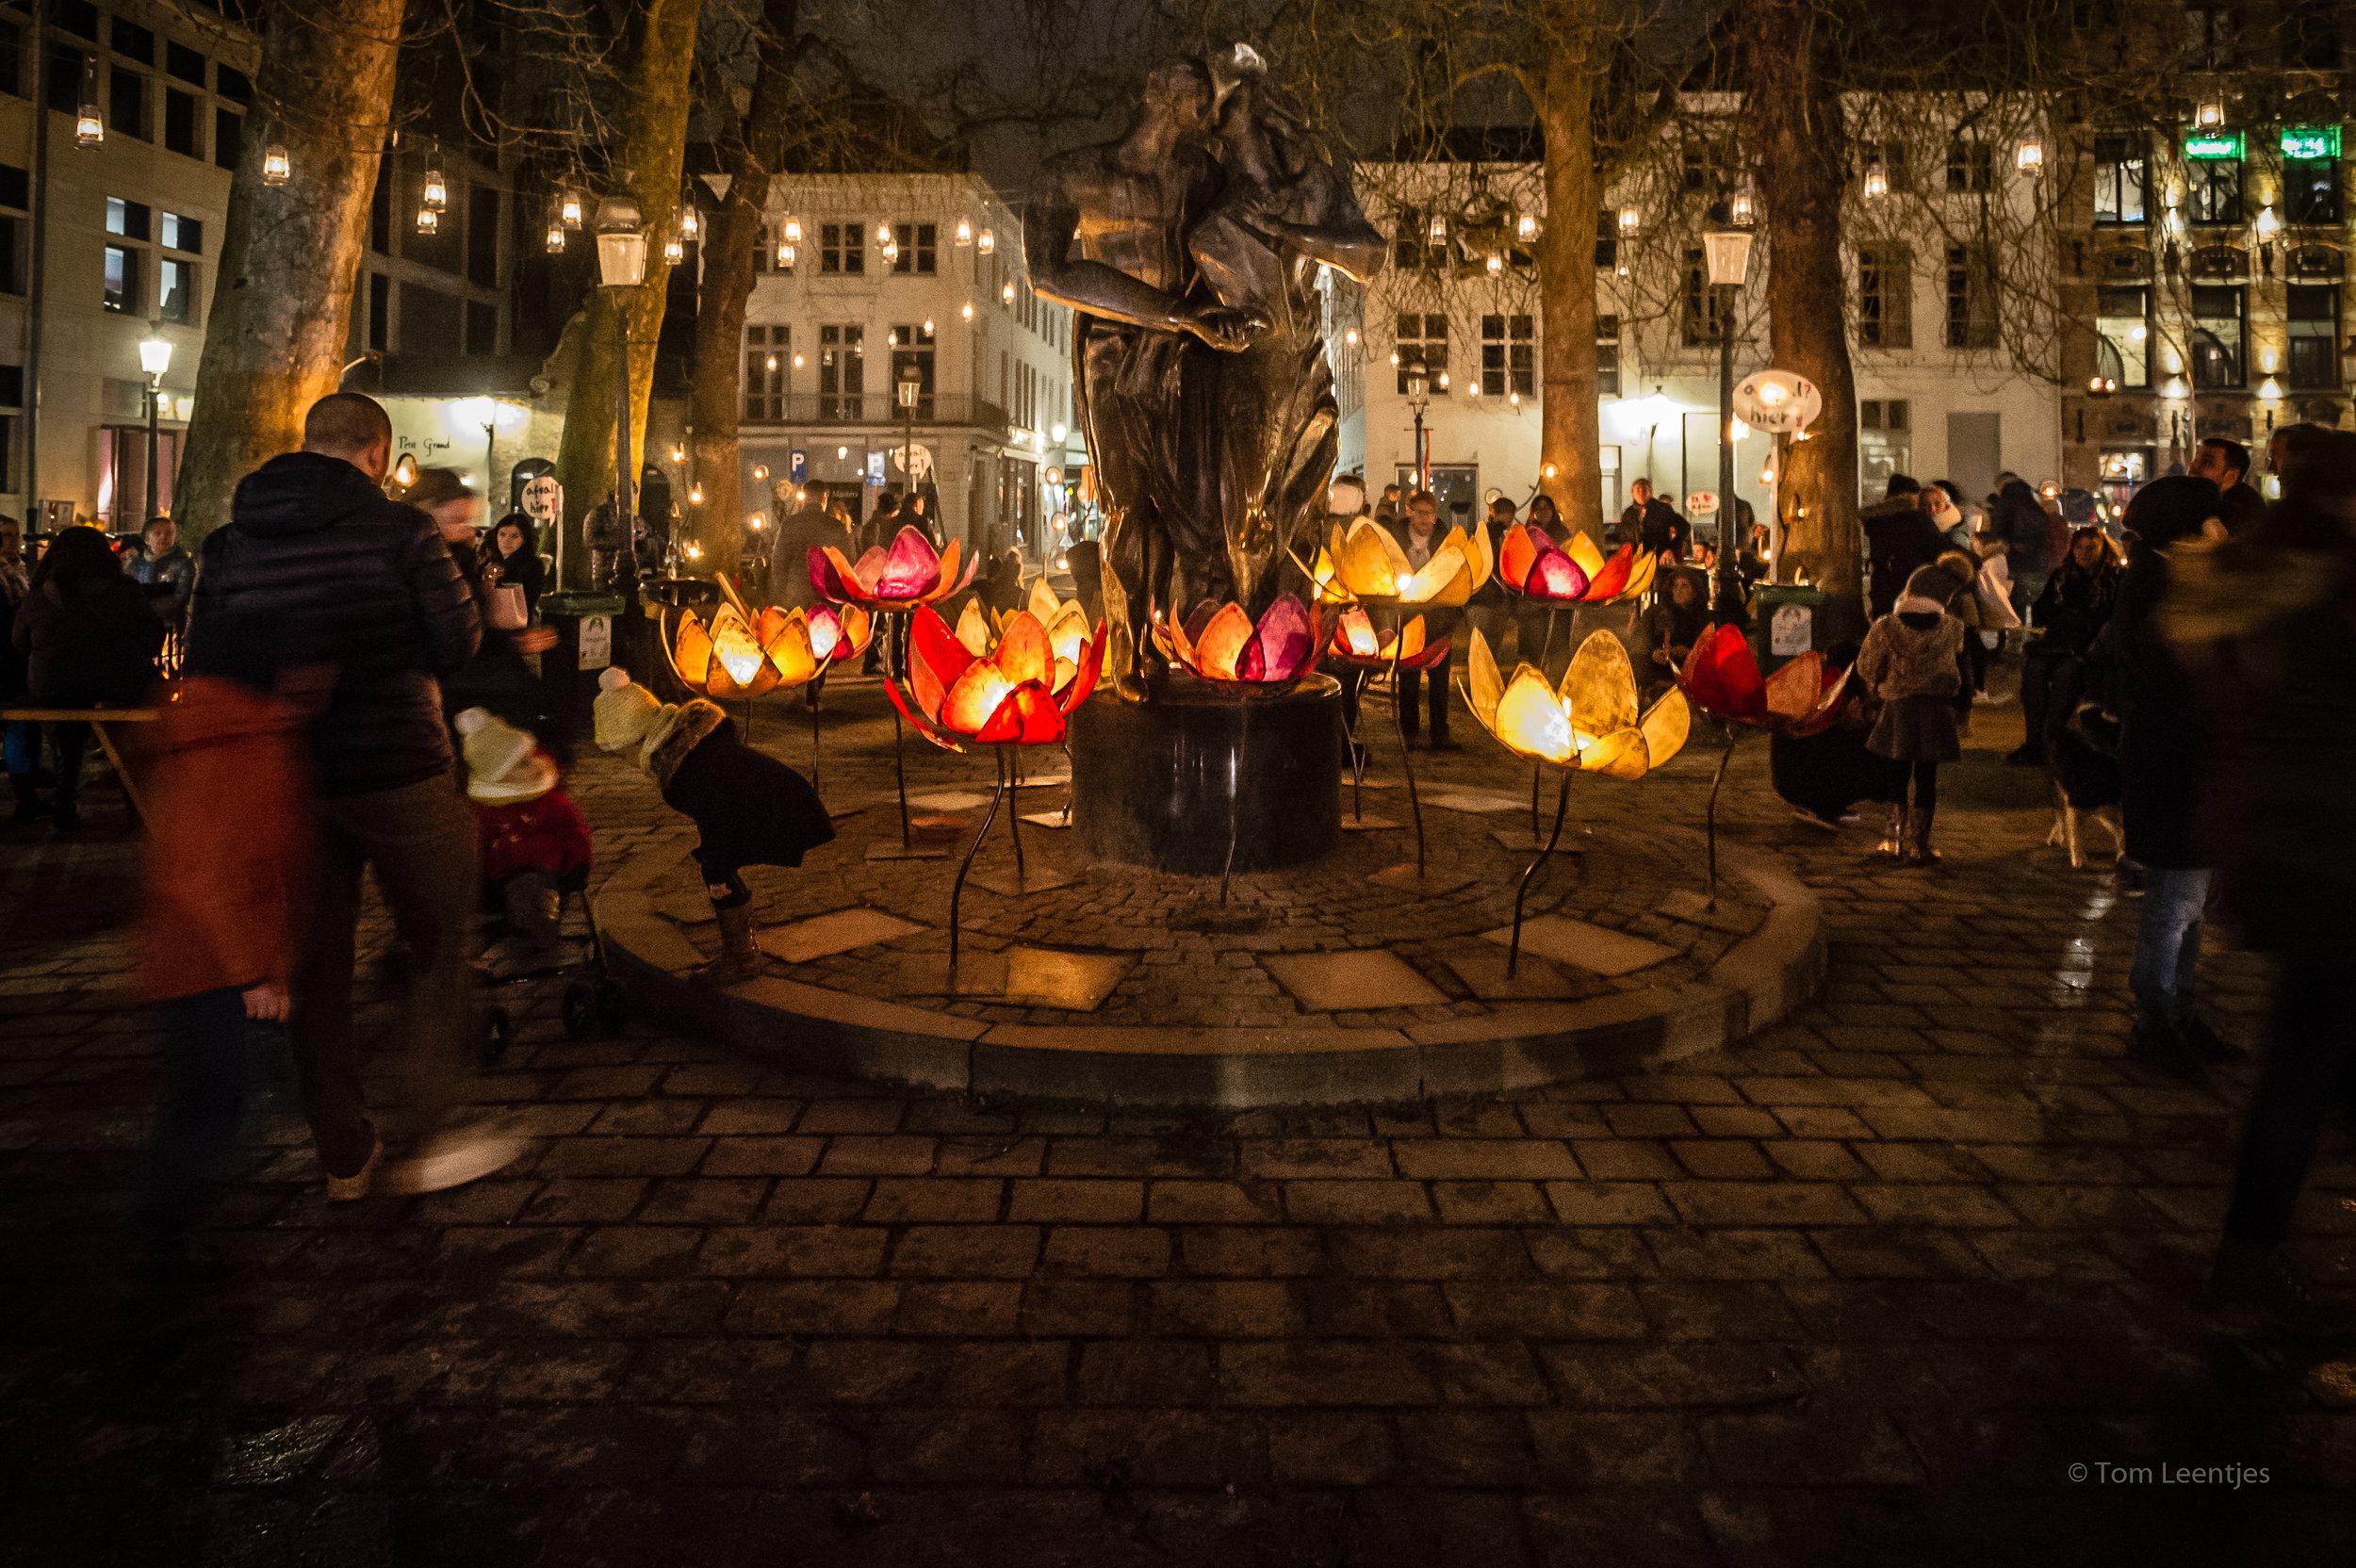 20180126_Wintervonken_Burg_Brugge_Tom_Leentjes-11.jpg